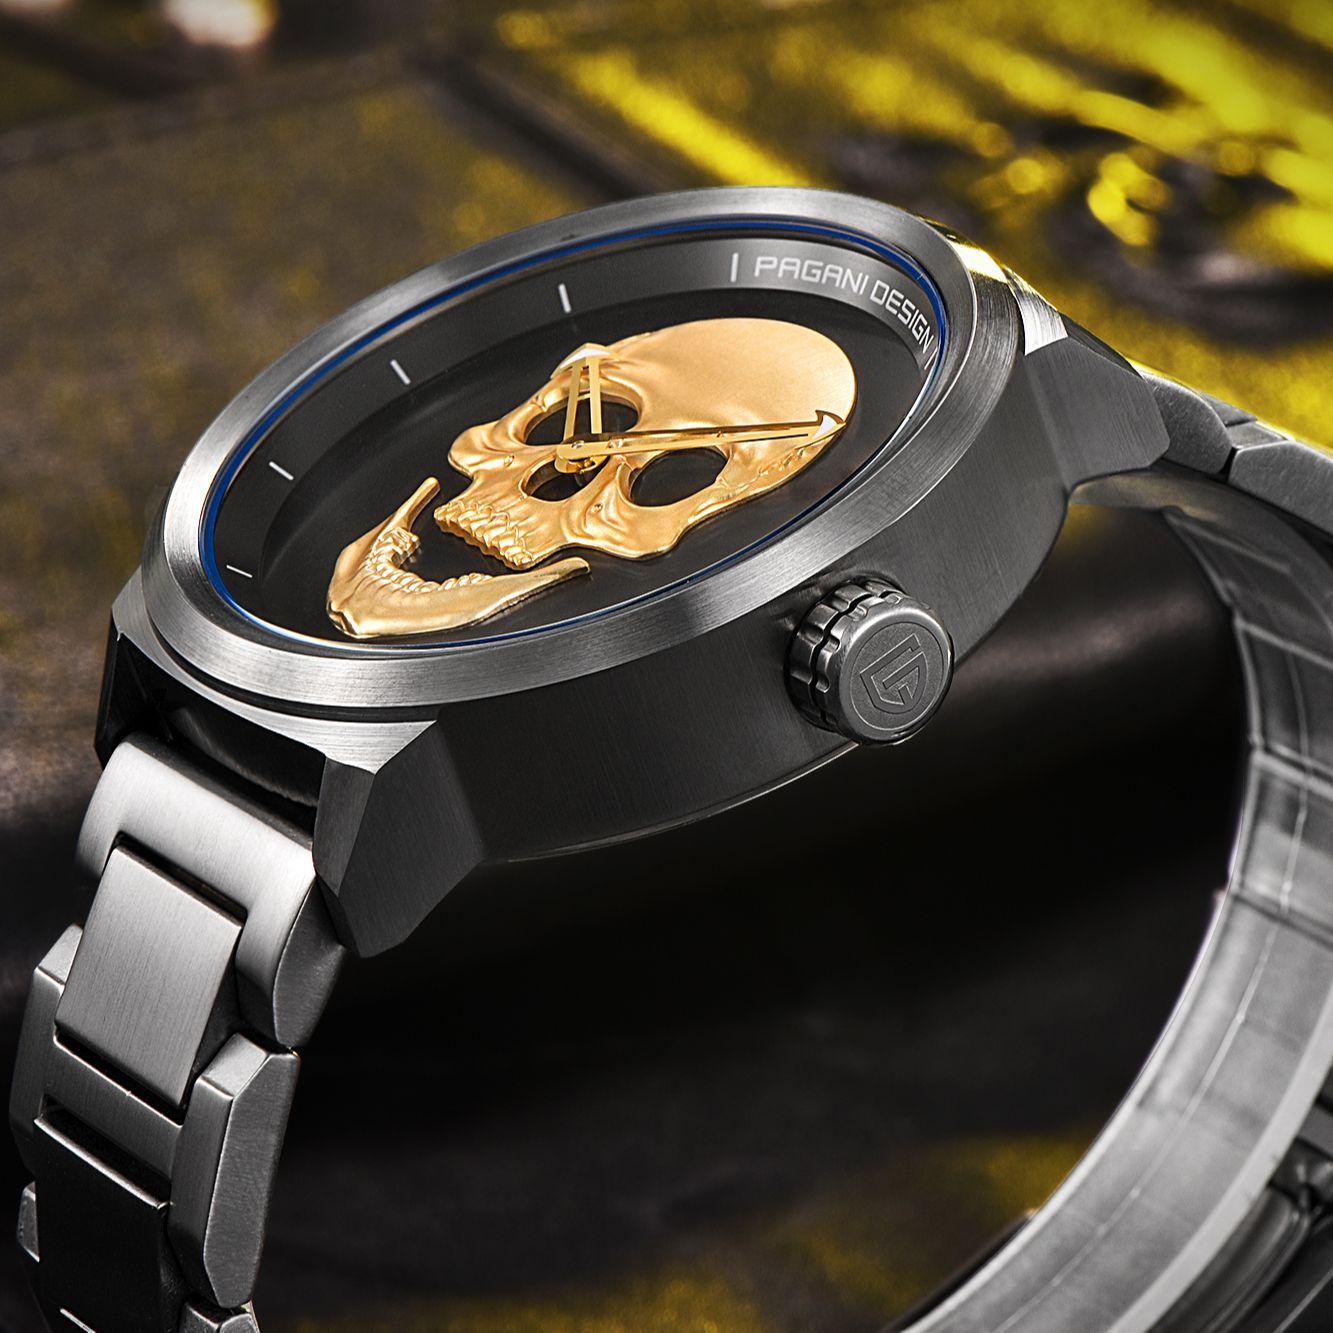 Pagani Design Top Brand Men's Military Sports Quartz Watch Luxury Fashion Retro 3D Skeleton Watch Men Automatic Waterproof Clock enlarge